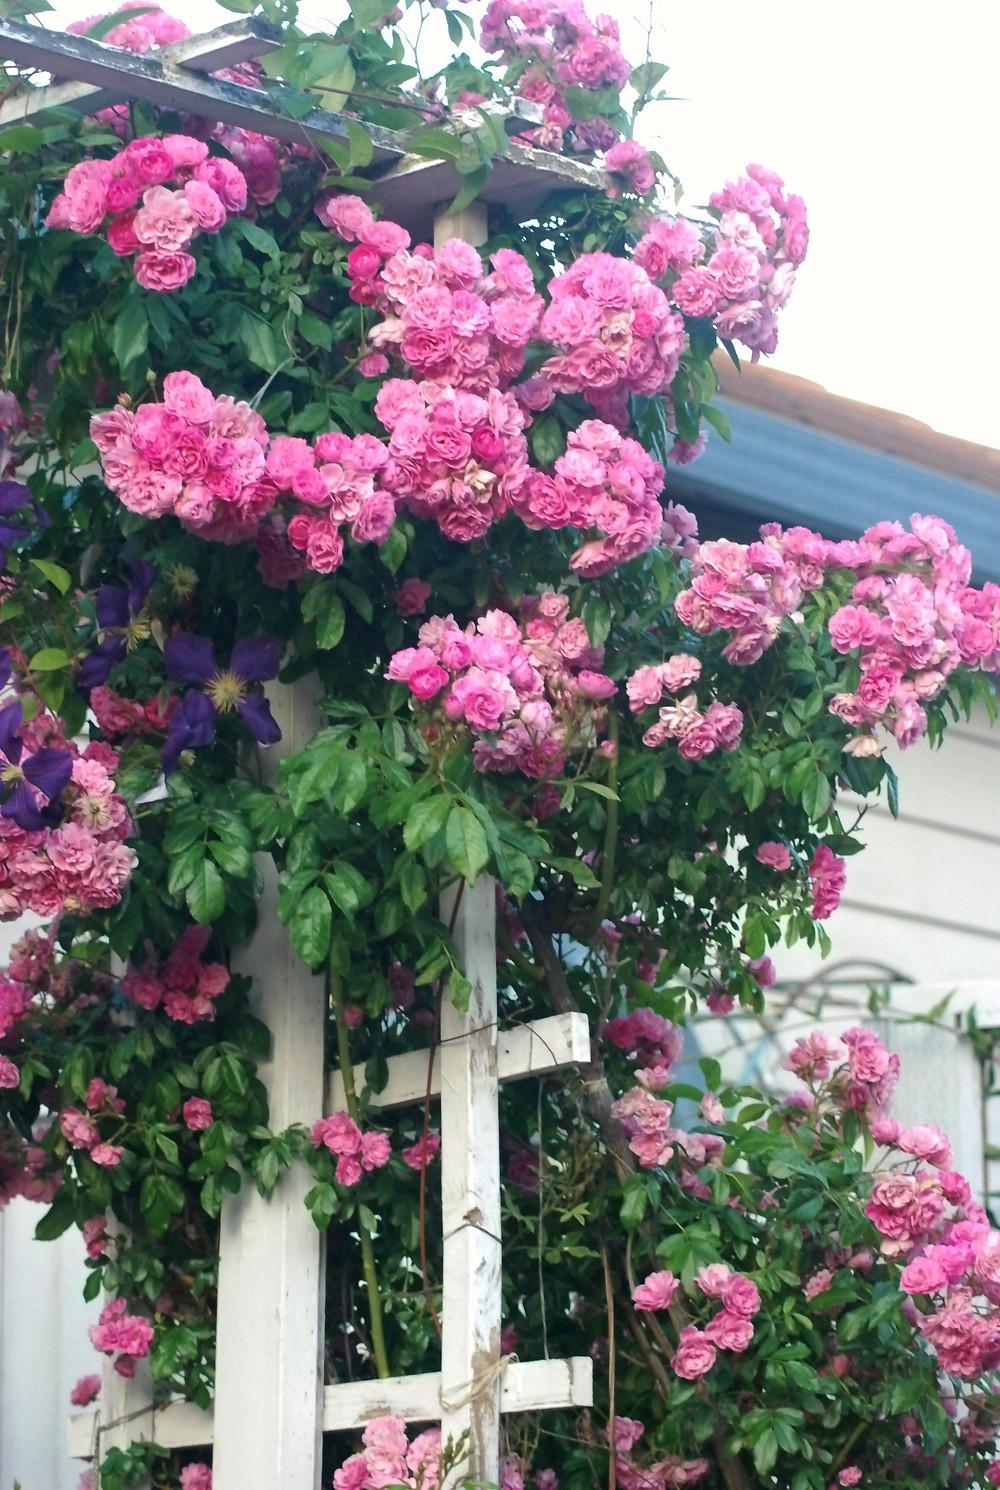 Climber 'Gardendirektor Otto Linne' is a very disease resistant rose in Dr. Sridharan's garden, phto Dr. Sridharan